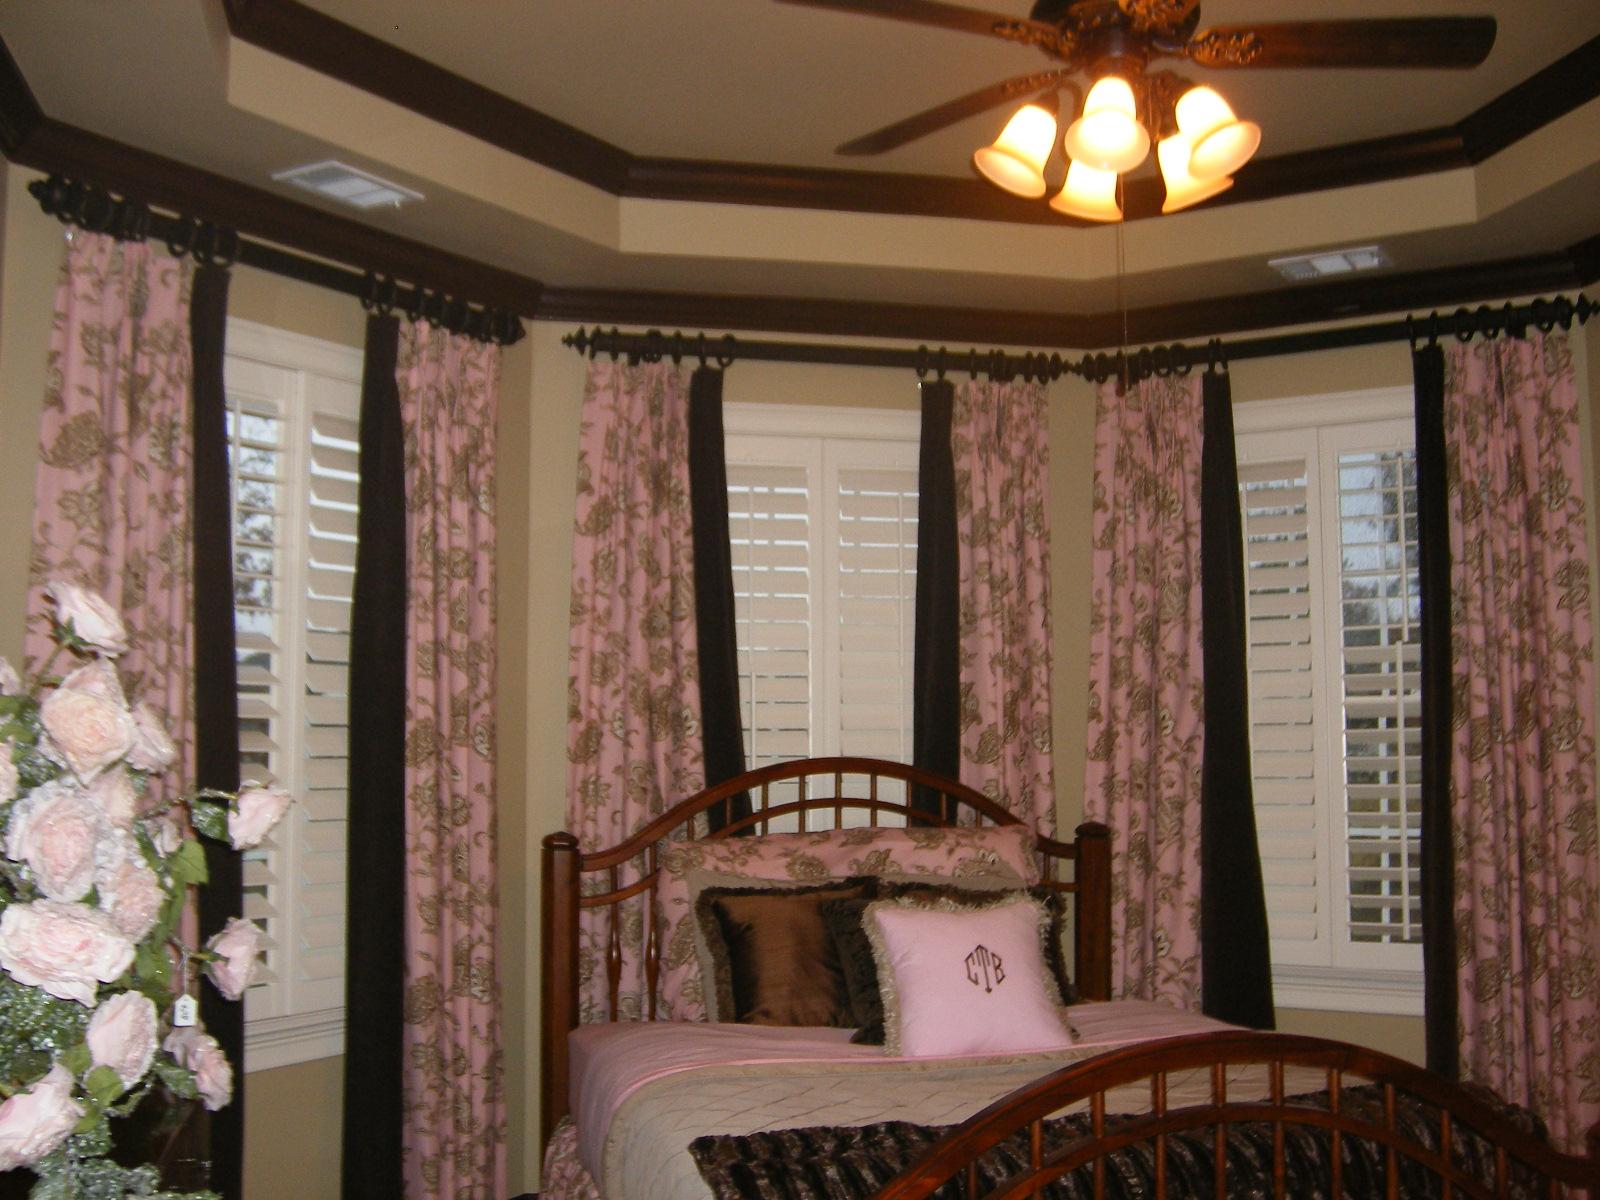 custom-blinds-drapery-shades-interior-design-atlanta-georgia-1.JPG